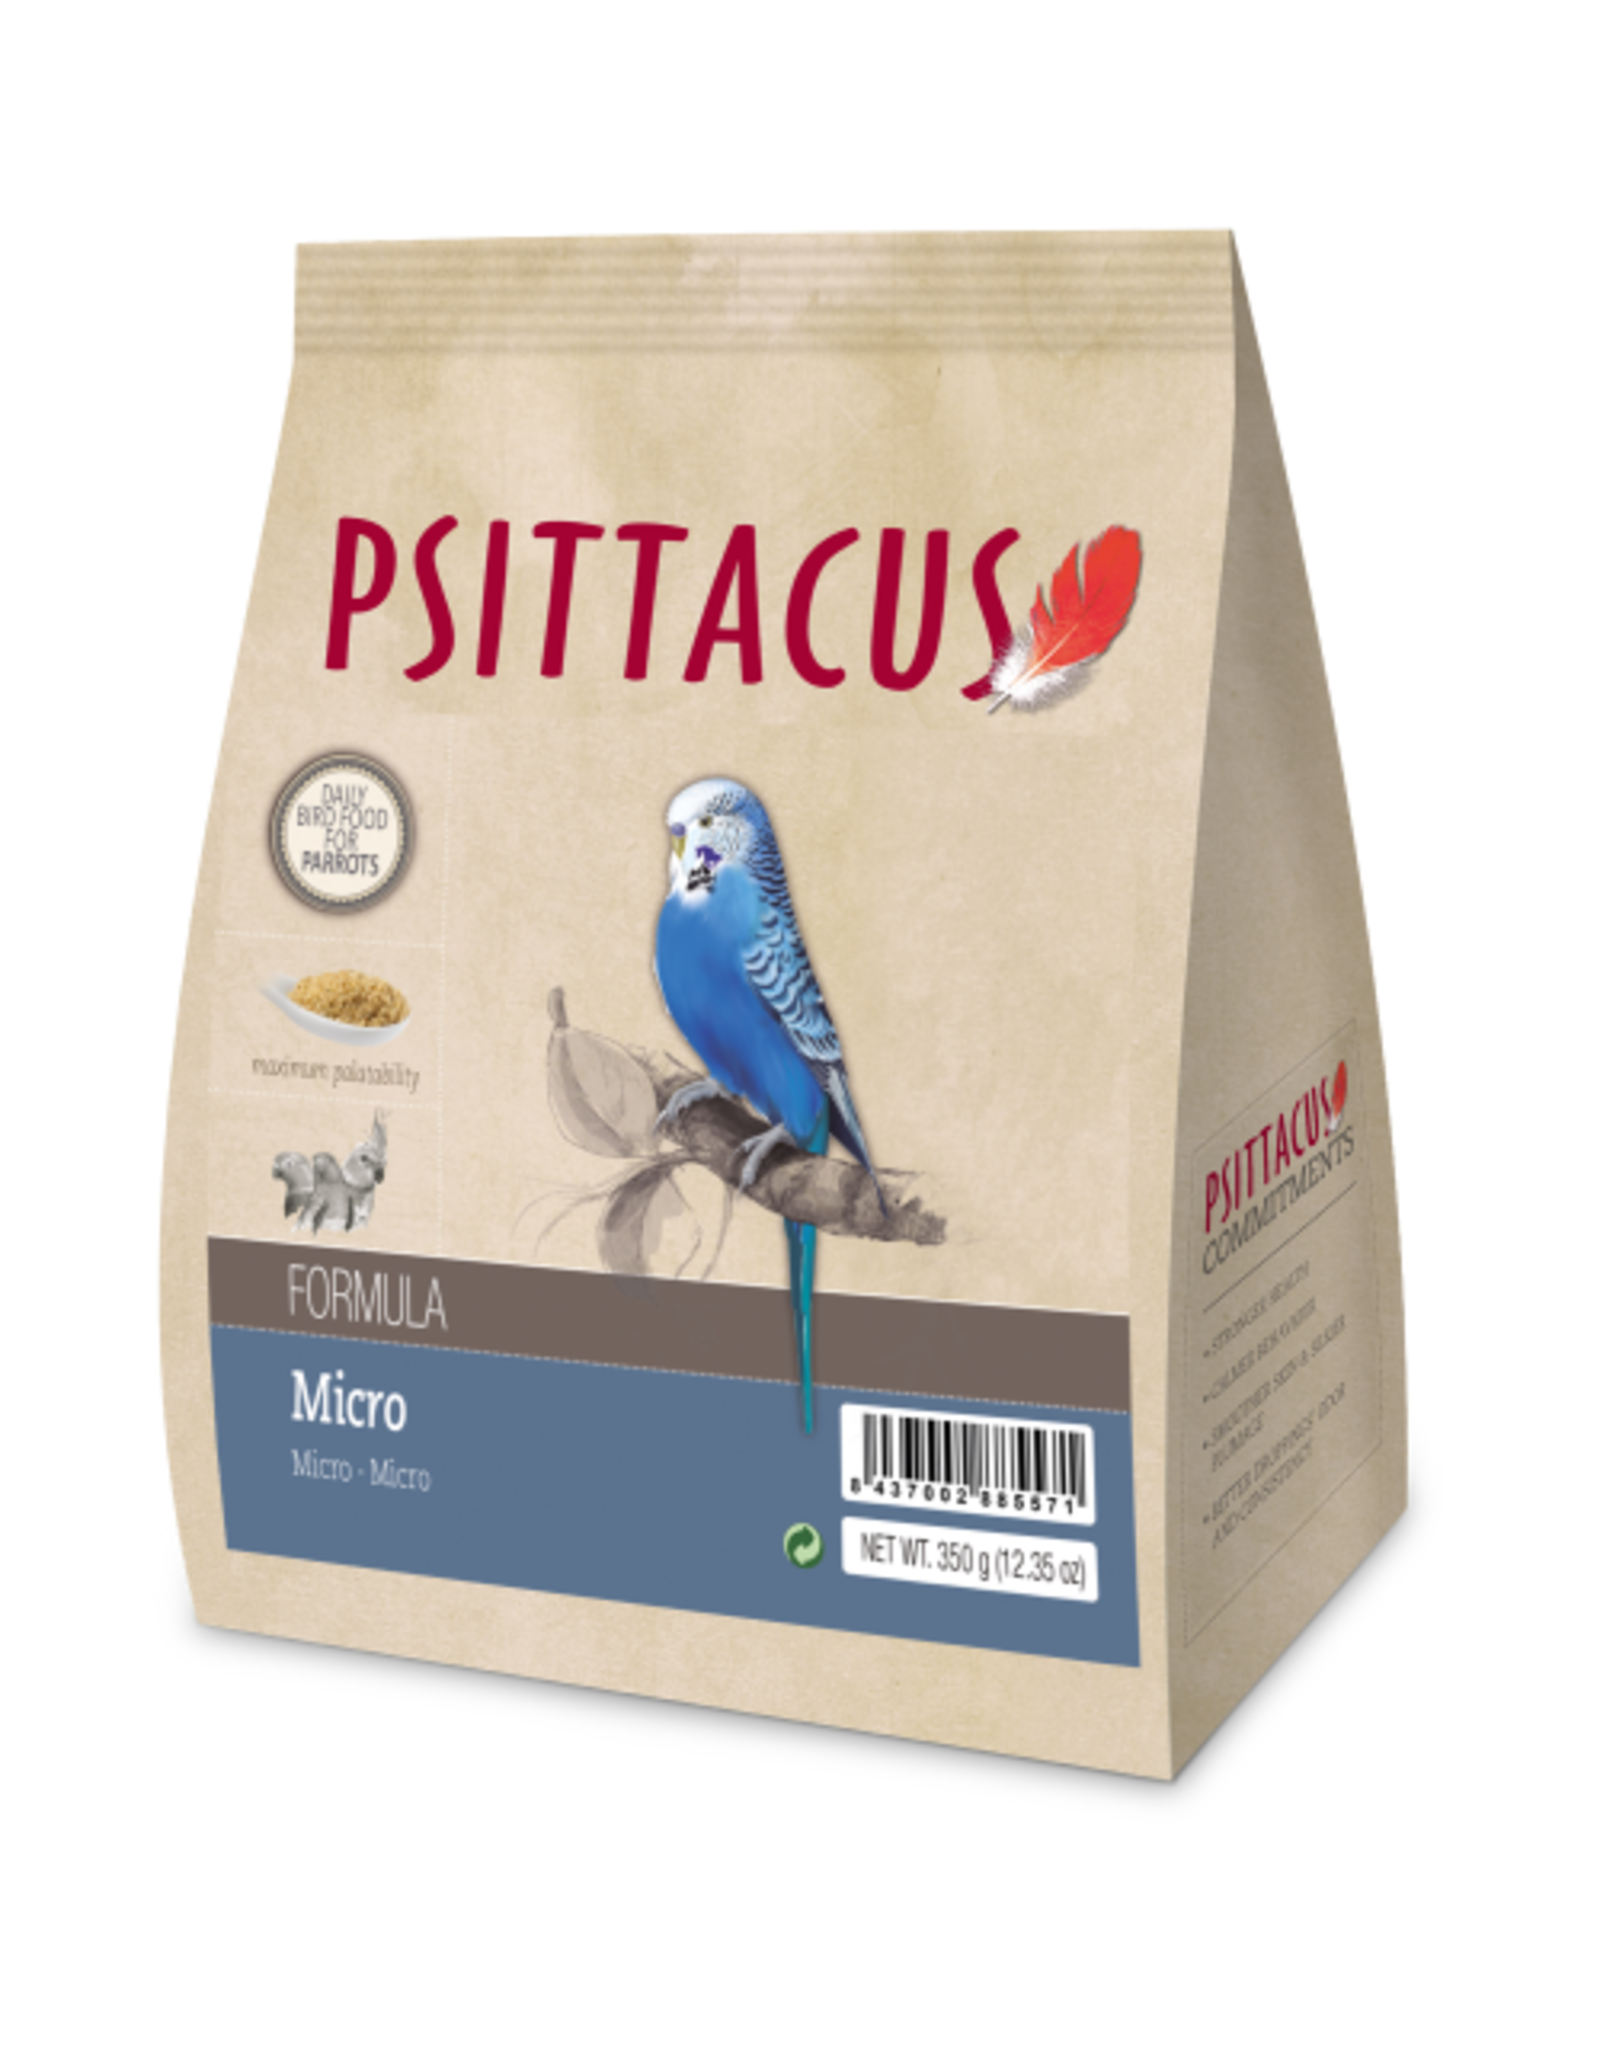 Psittacus maintenance micro formula